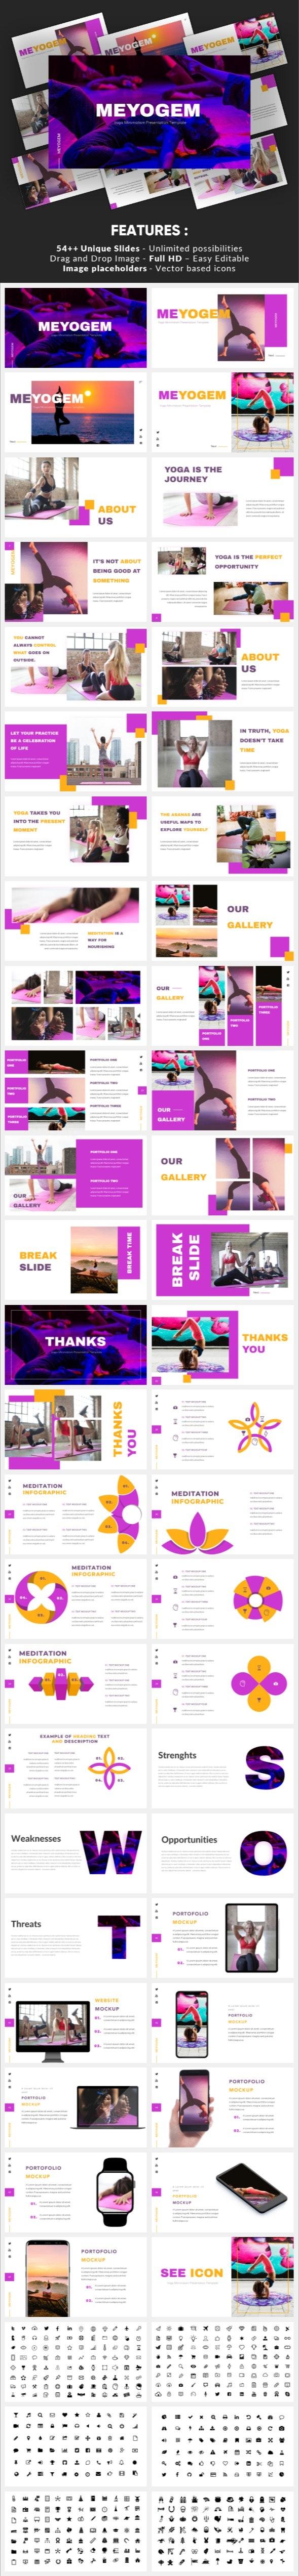 Meyogem - Yoga Minimalism Google Slides Template - Google Slides Presentation Templates